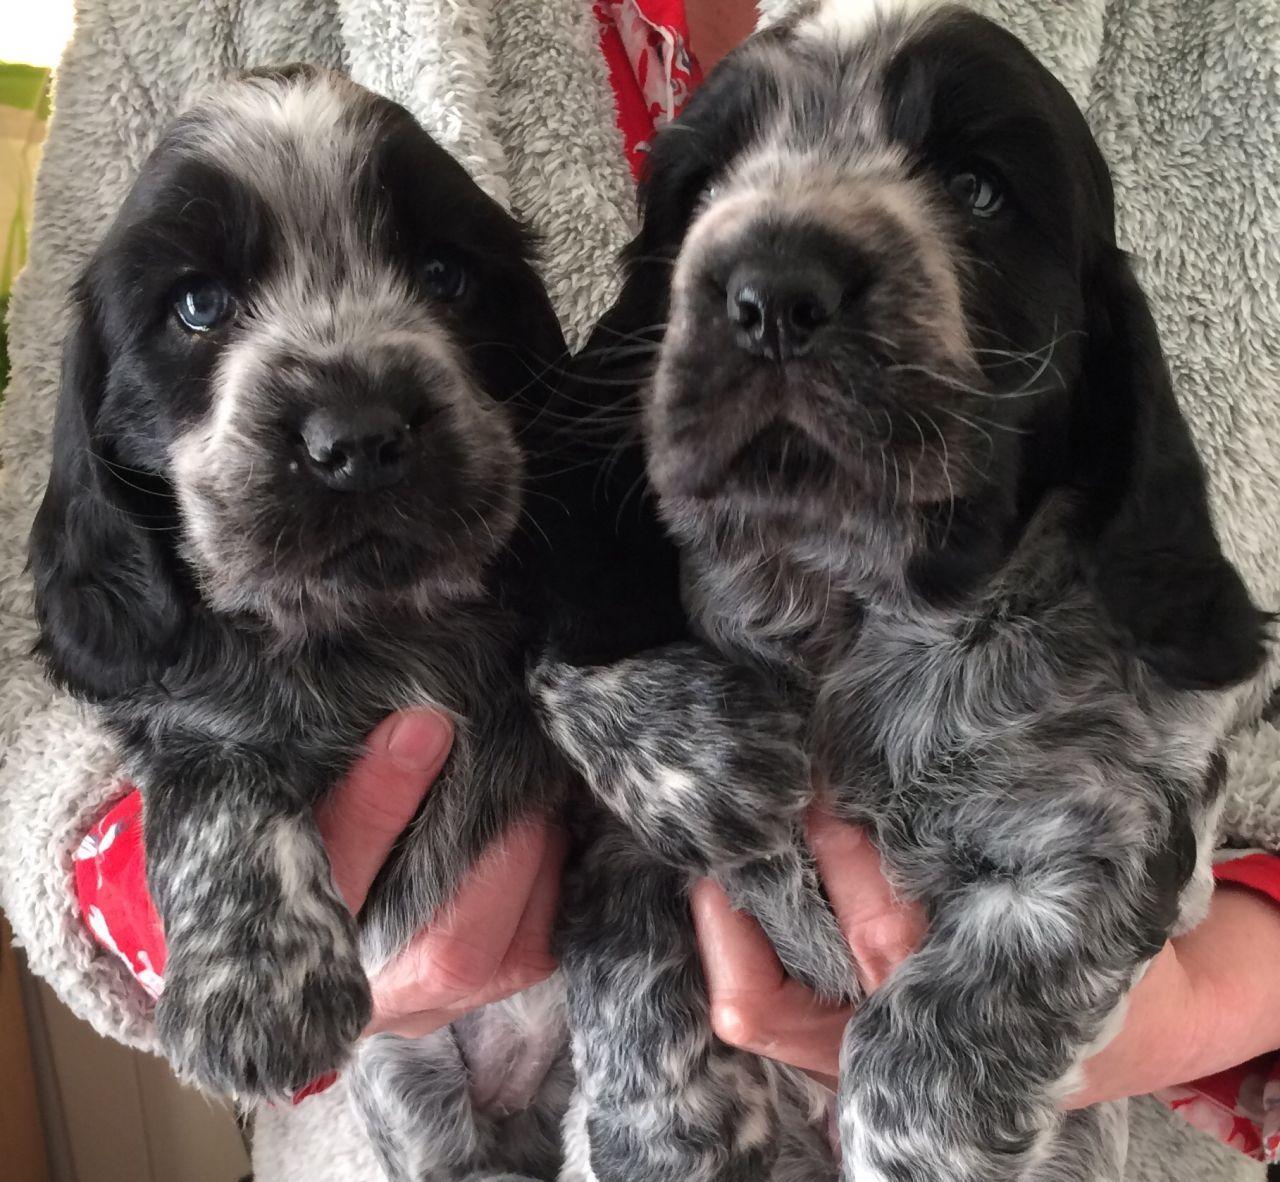 Beautiful Cocker Spaniel Puppies Alloa Clackmannanshire Pets4homes Cocker Spaniel Puppies Spaniel Puppies Spaniel Puppies For Sale